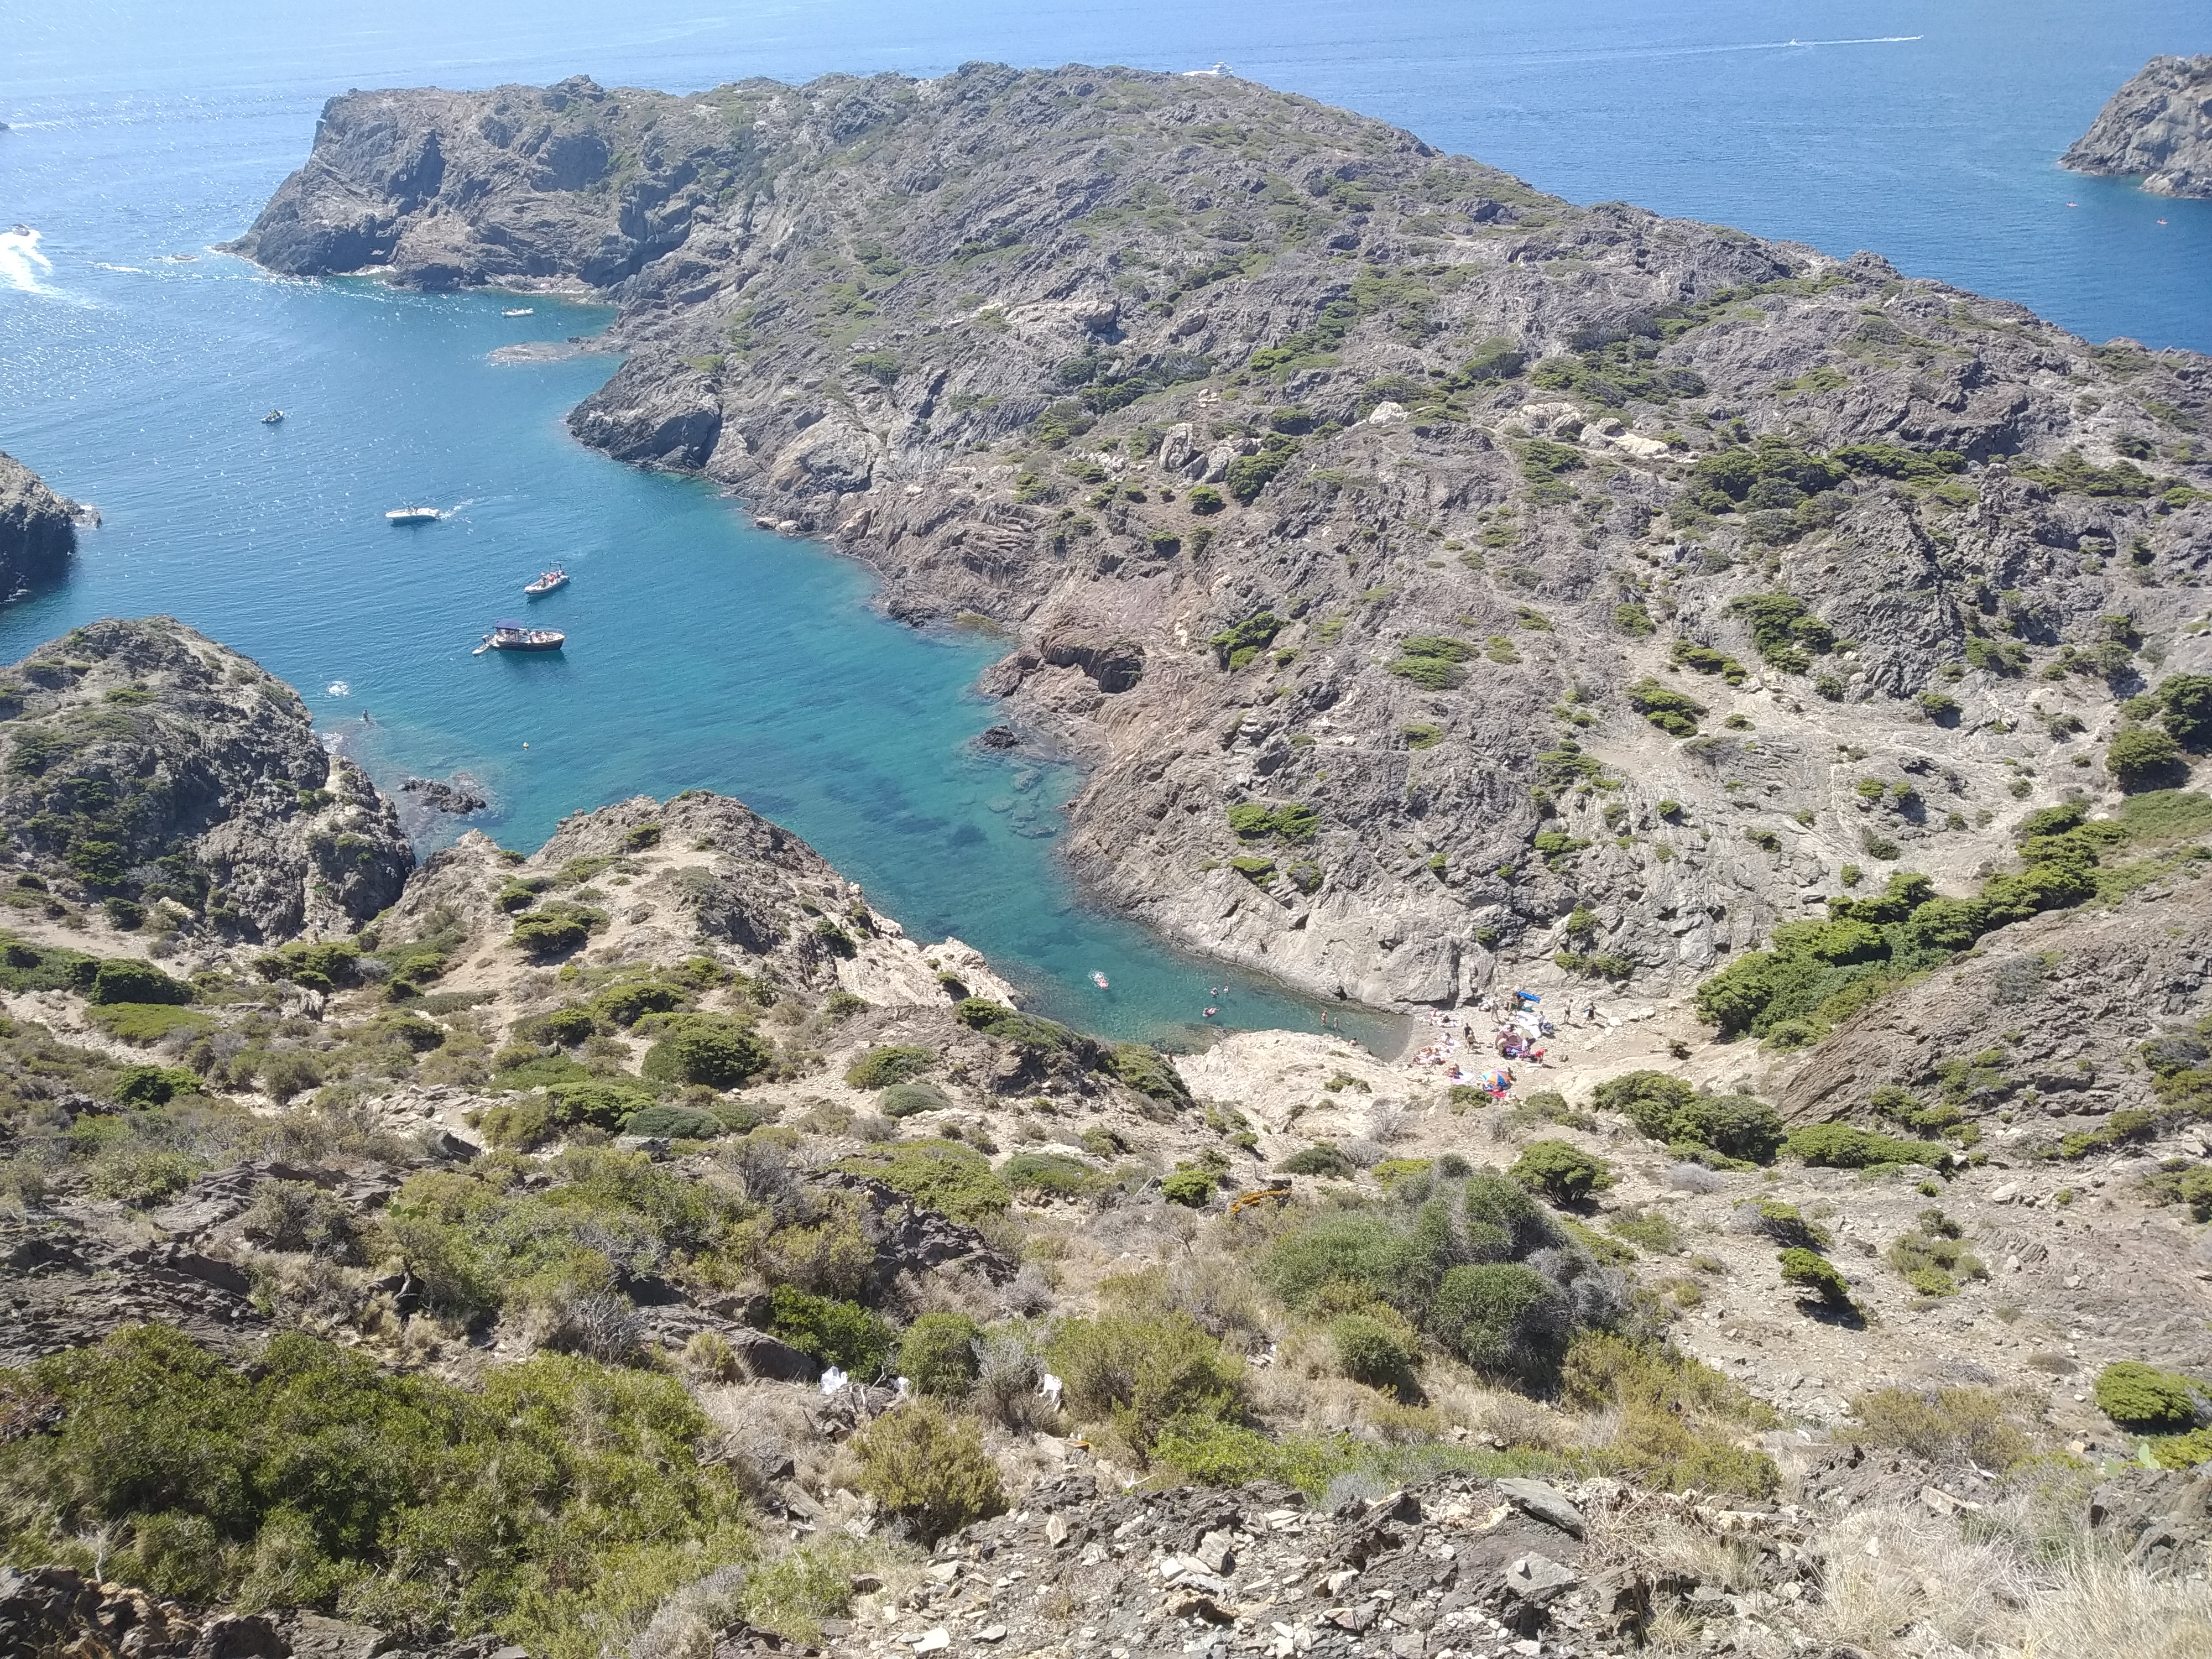 Pohlad na zatoku Cala Fredosa Cap de Creus